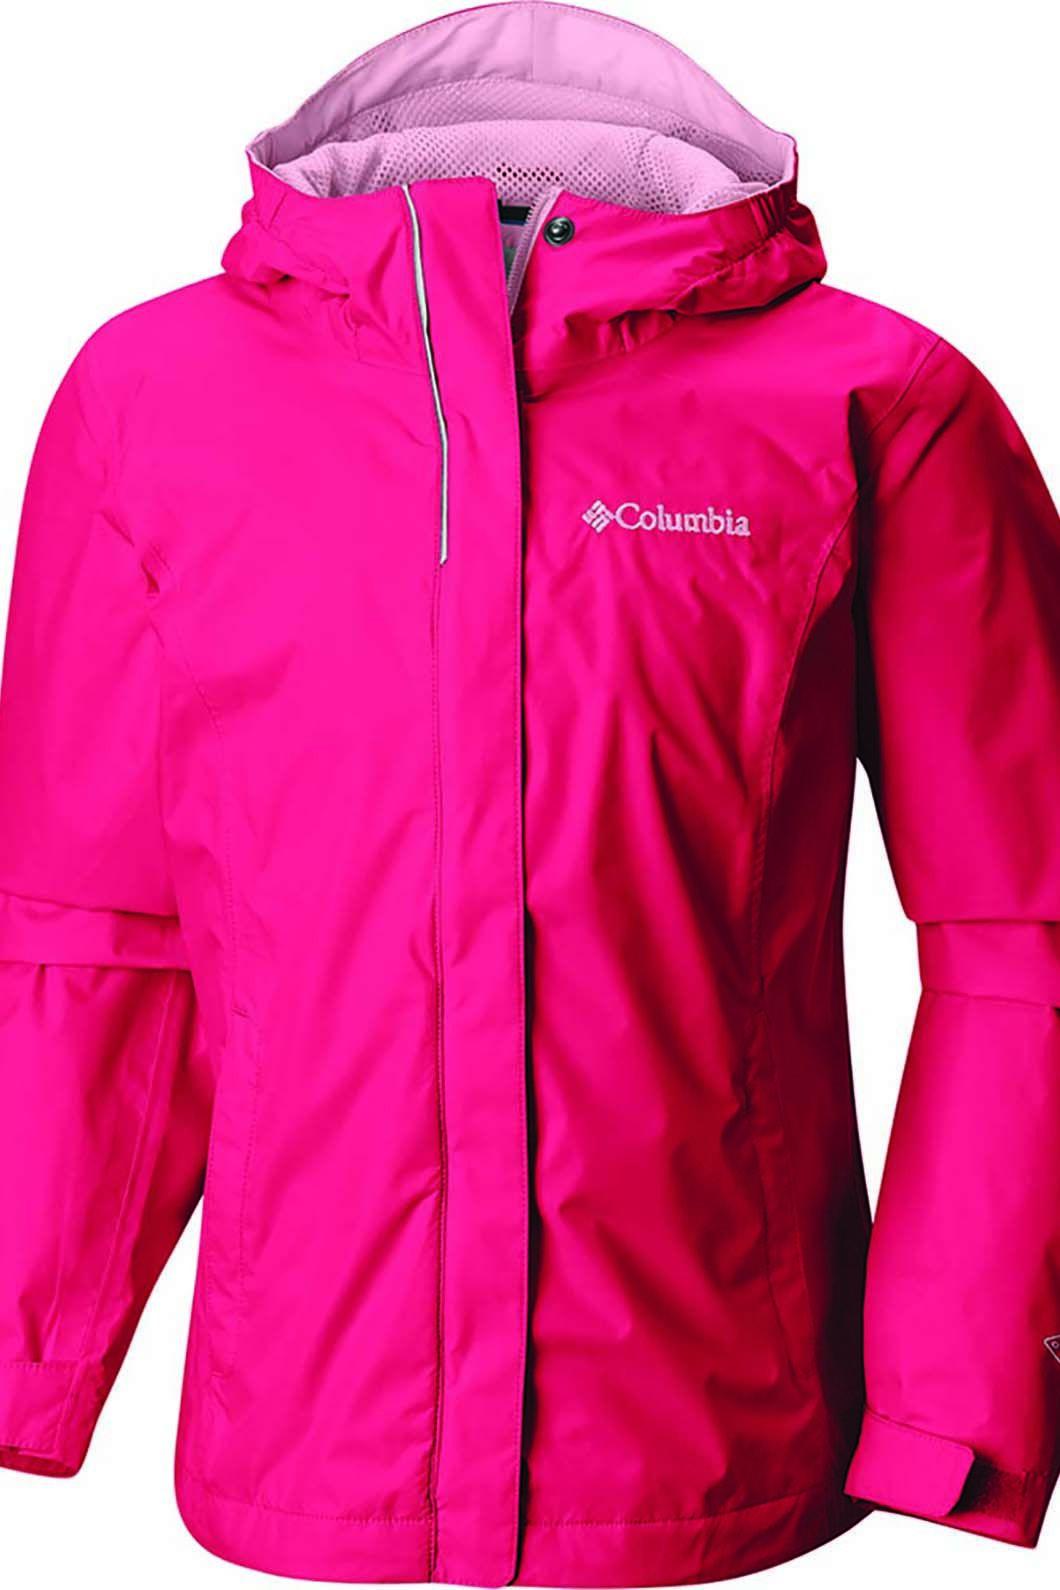 Columbia Kids' Arcadia Jacket, Pink, hi-res